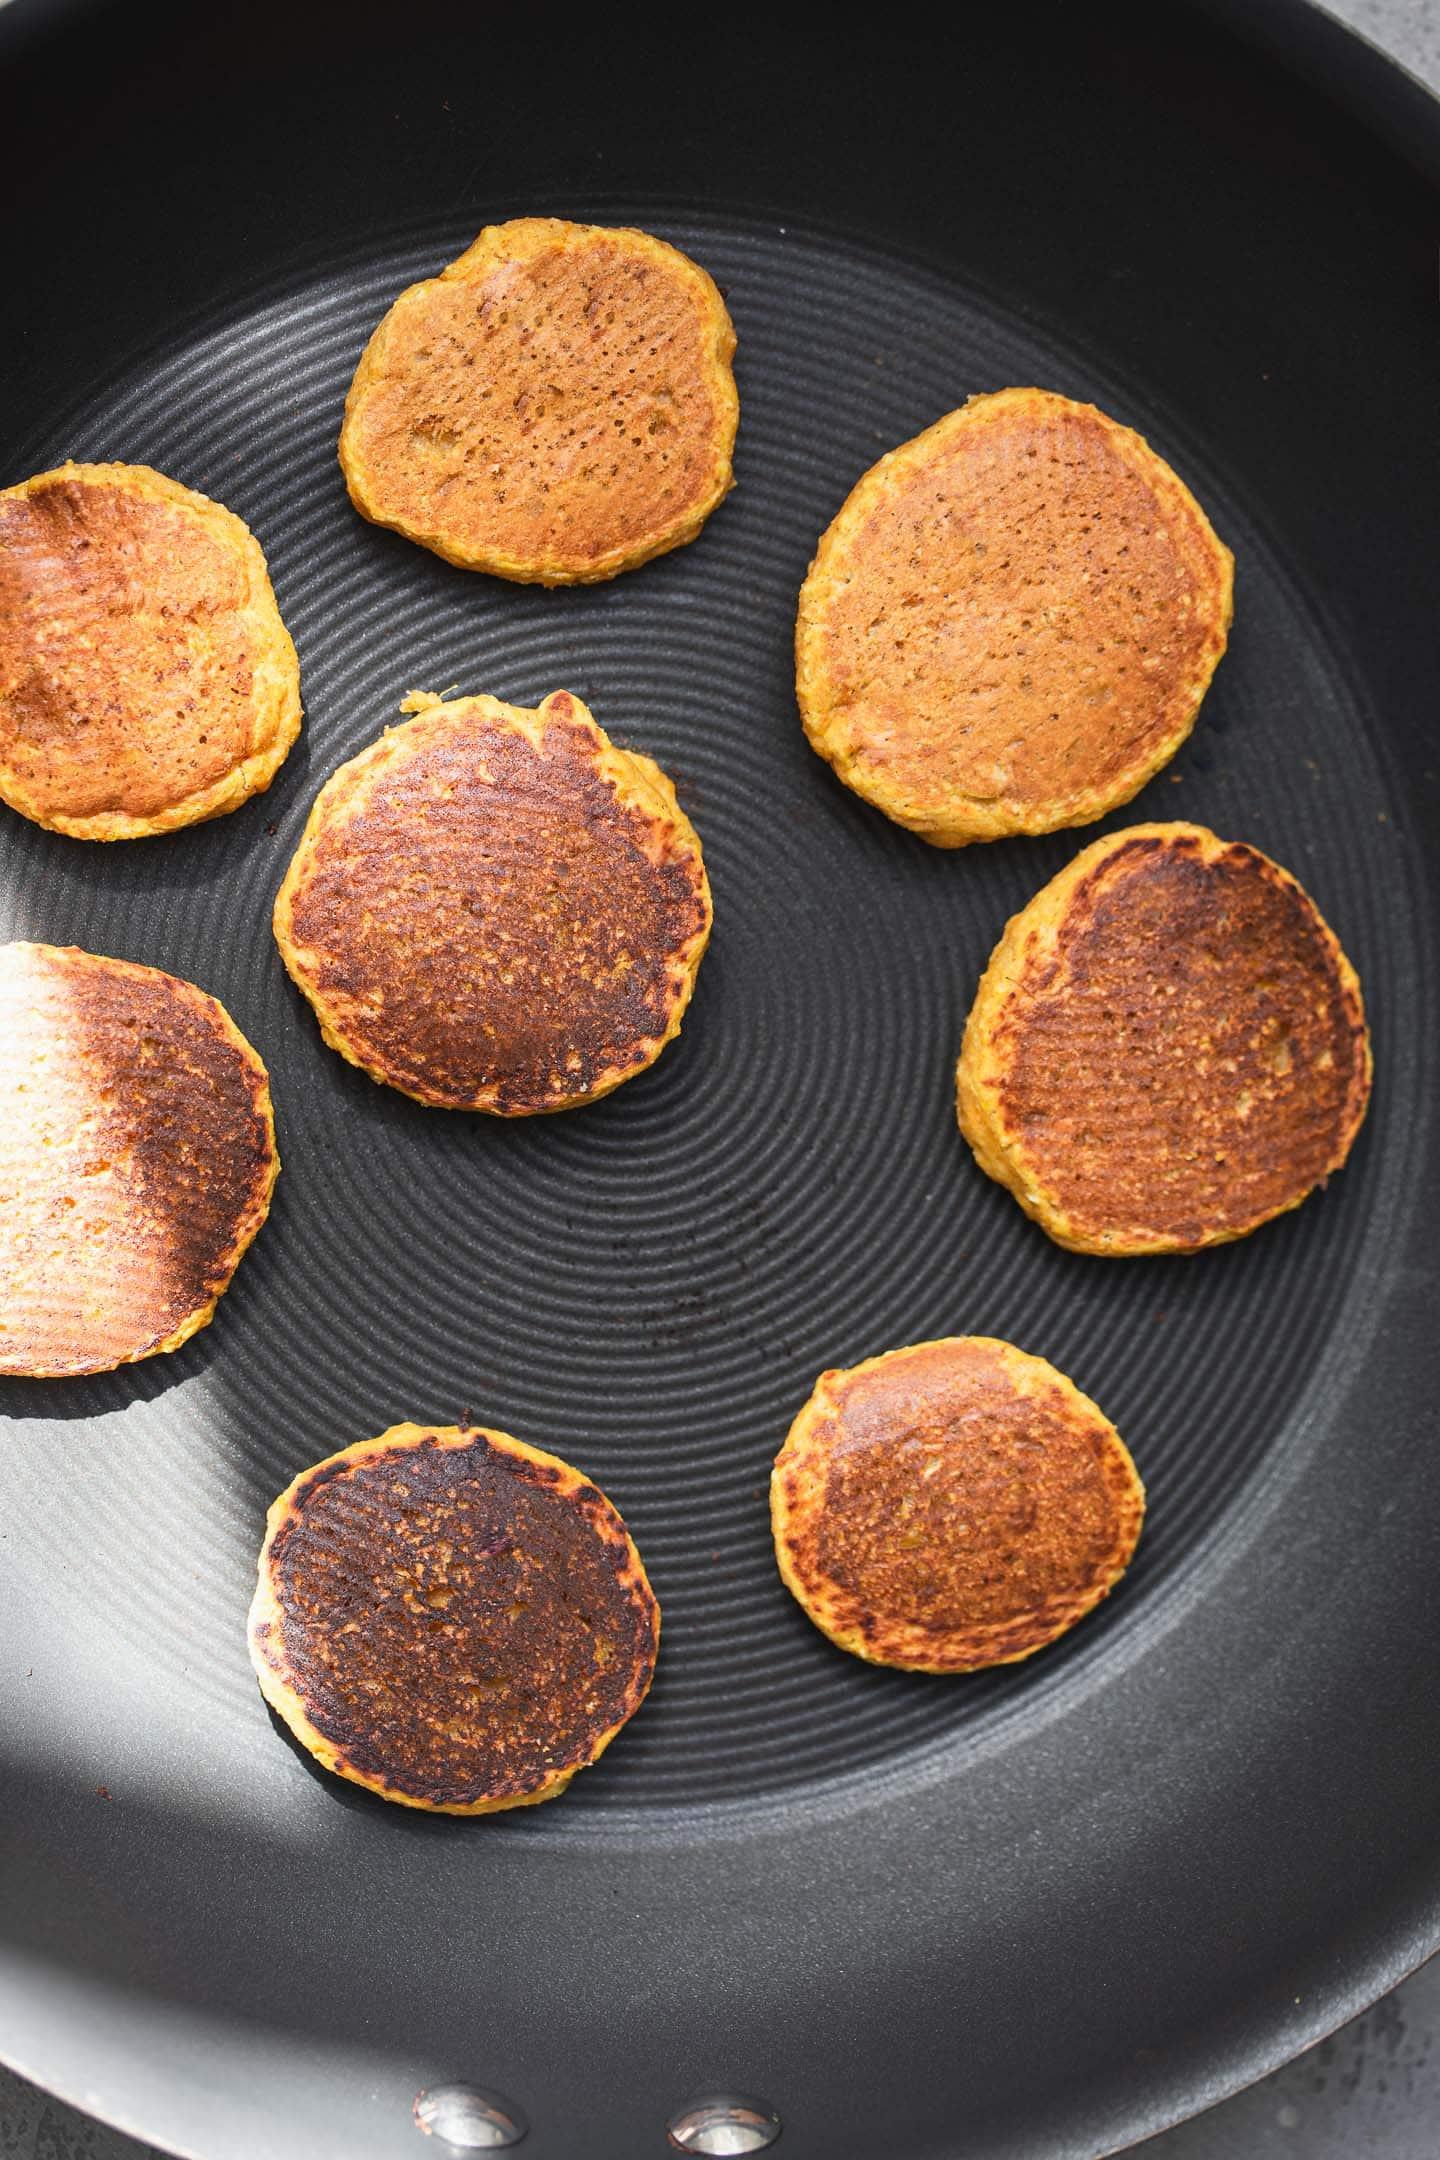 Mini vegan pancakes in a frying pan